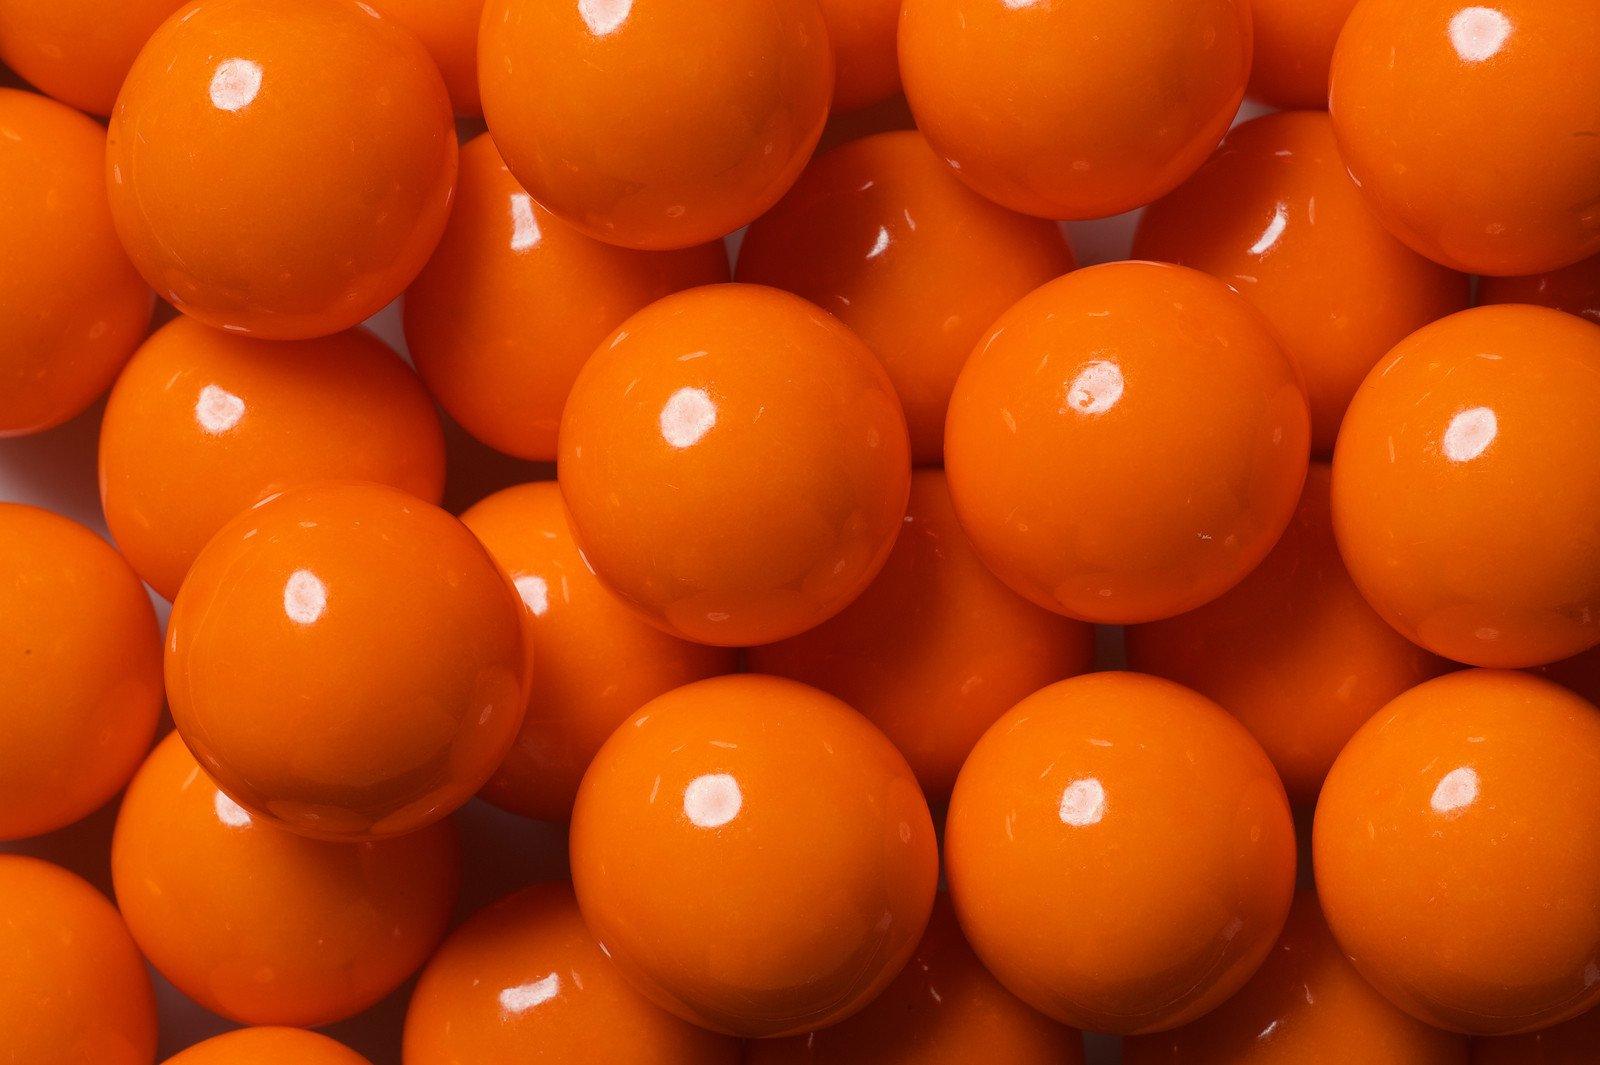 Candy Shop Orange 1-Inch Gumballs 1 Pound Bag